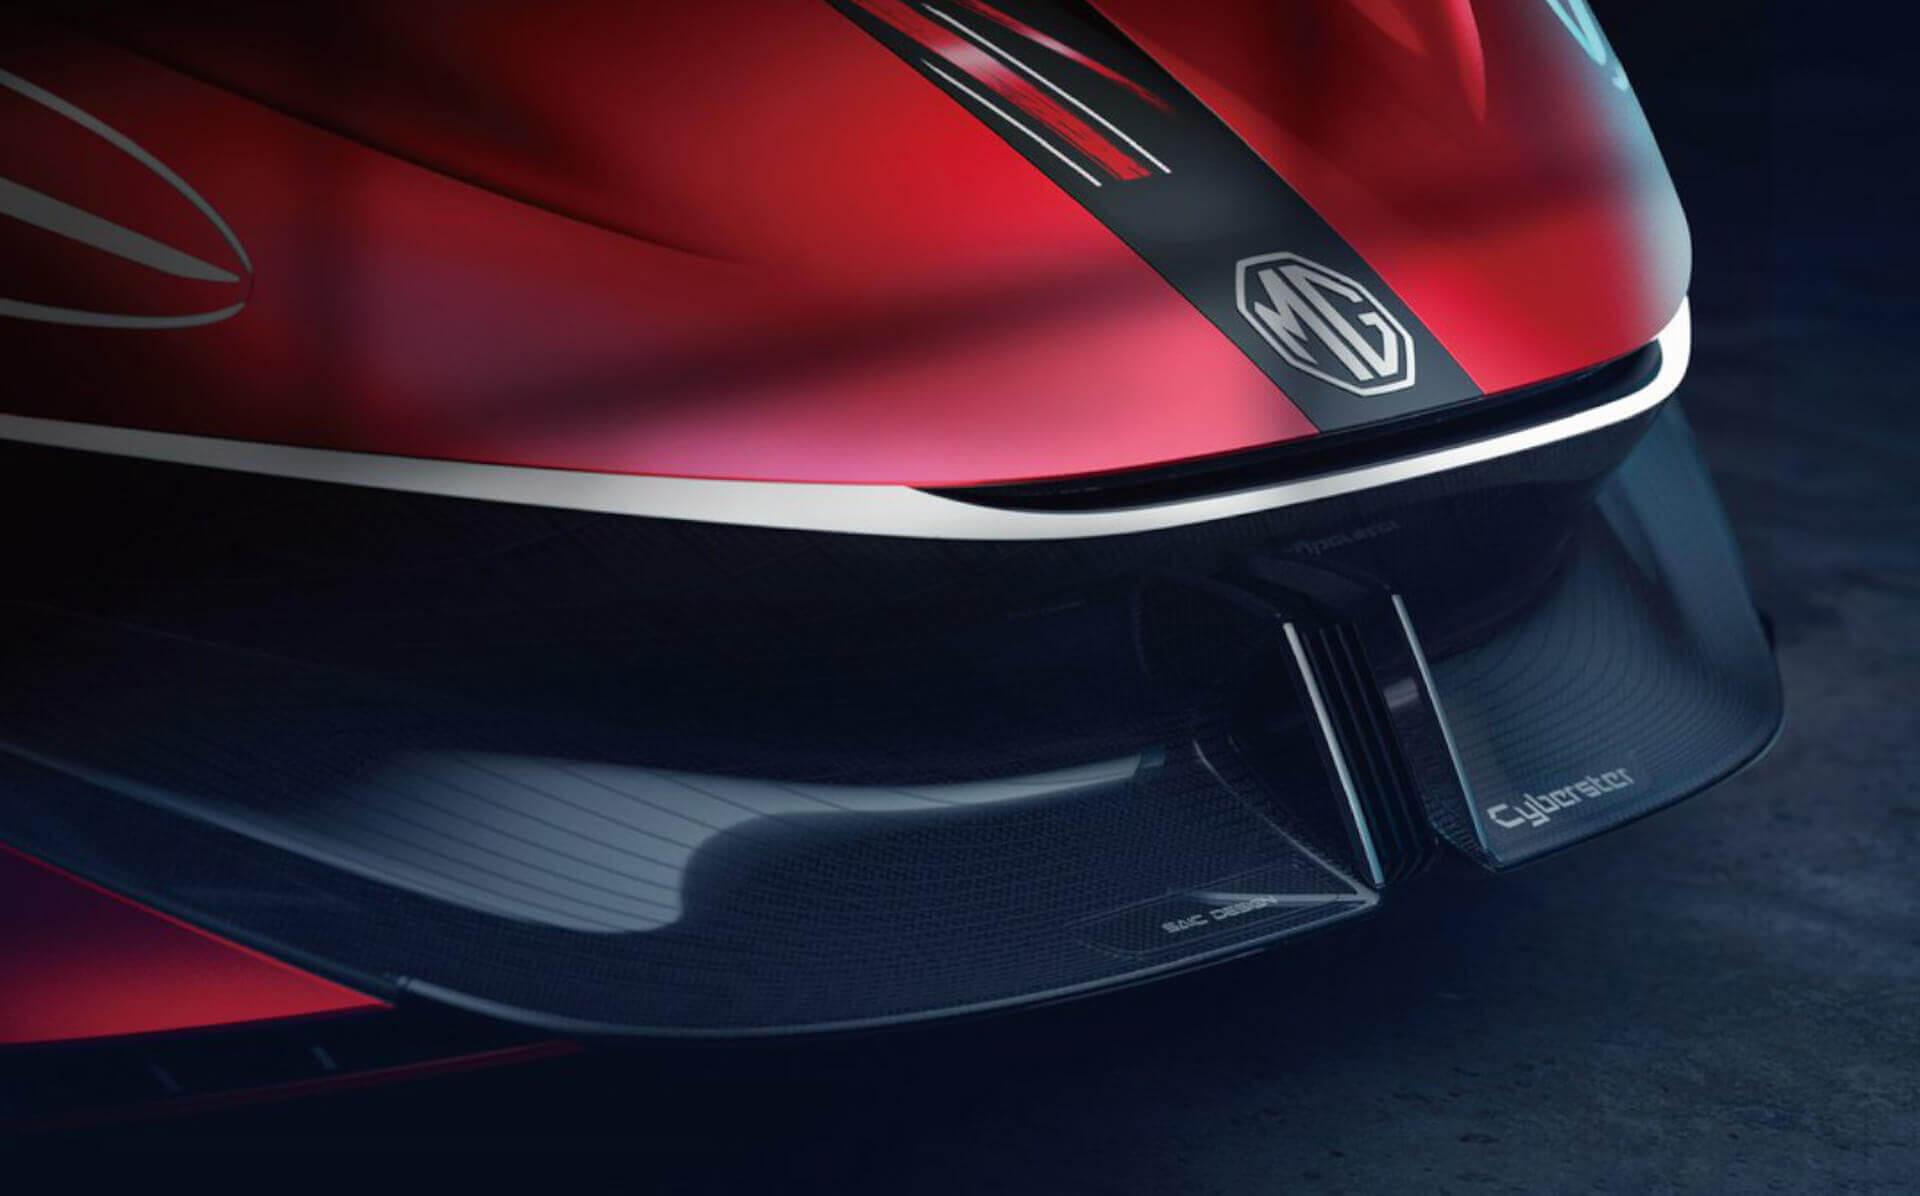 MG представил концепт спорткара Cyberster перед премьерой в Шанхае